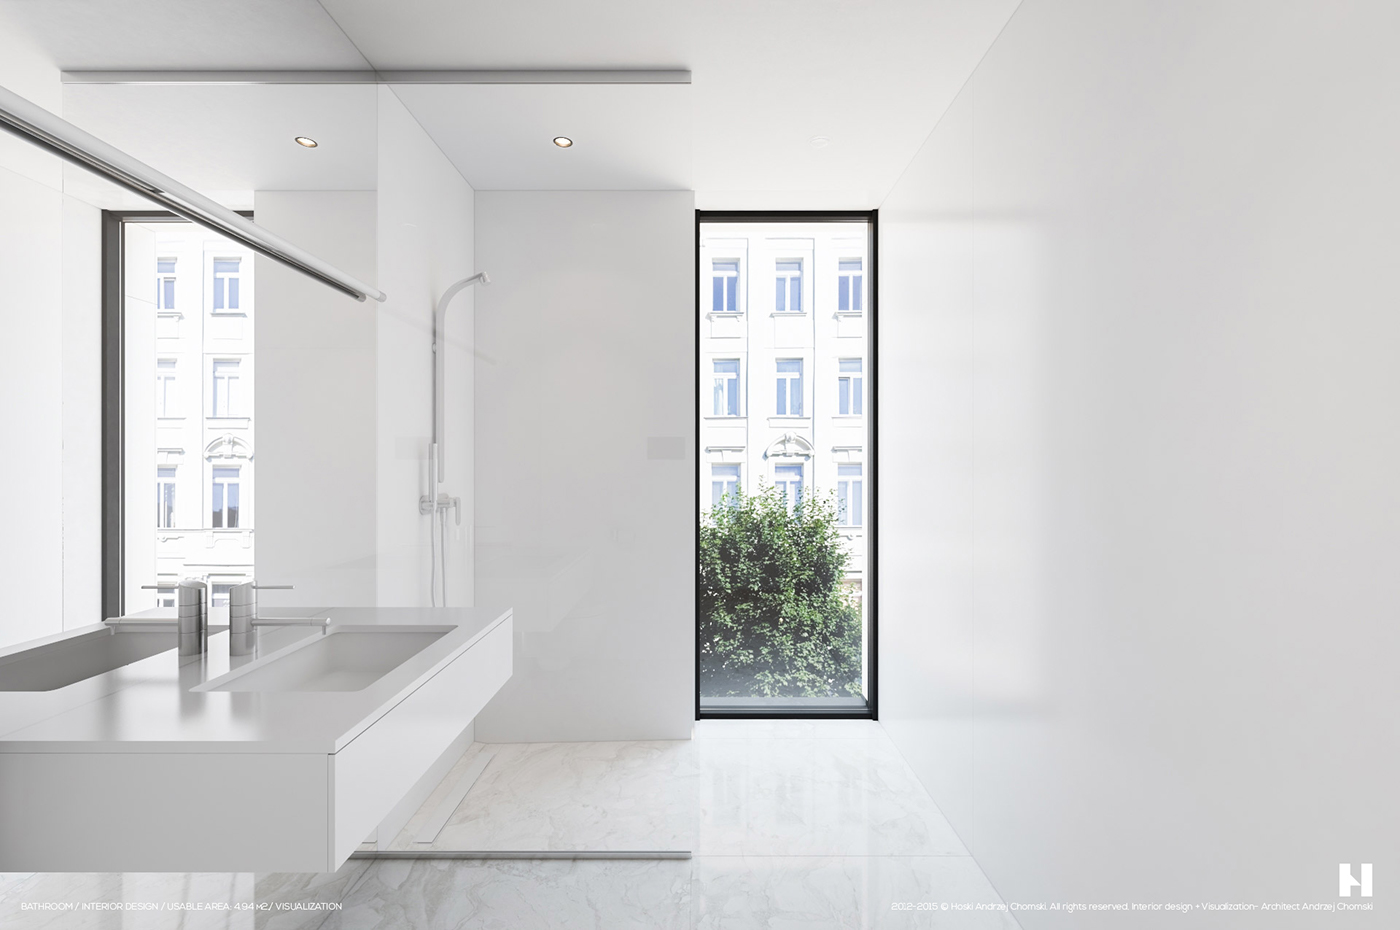 Bathroom / 4.94 on Behance